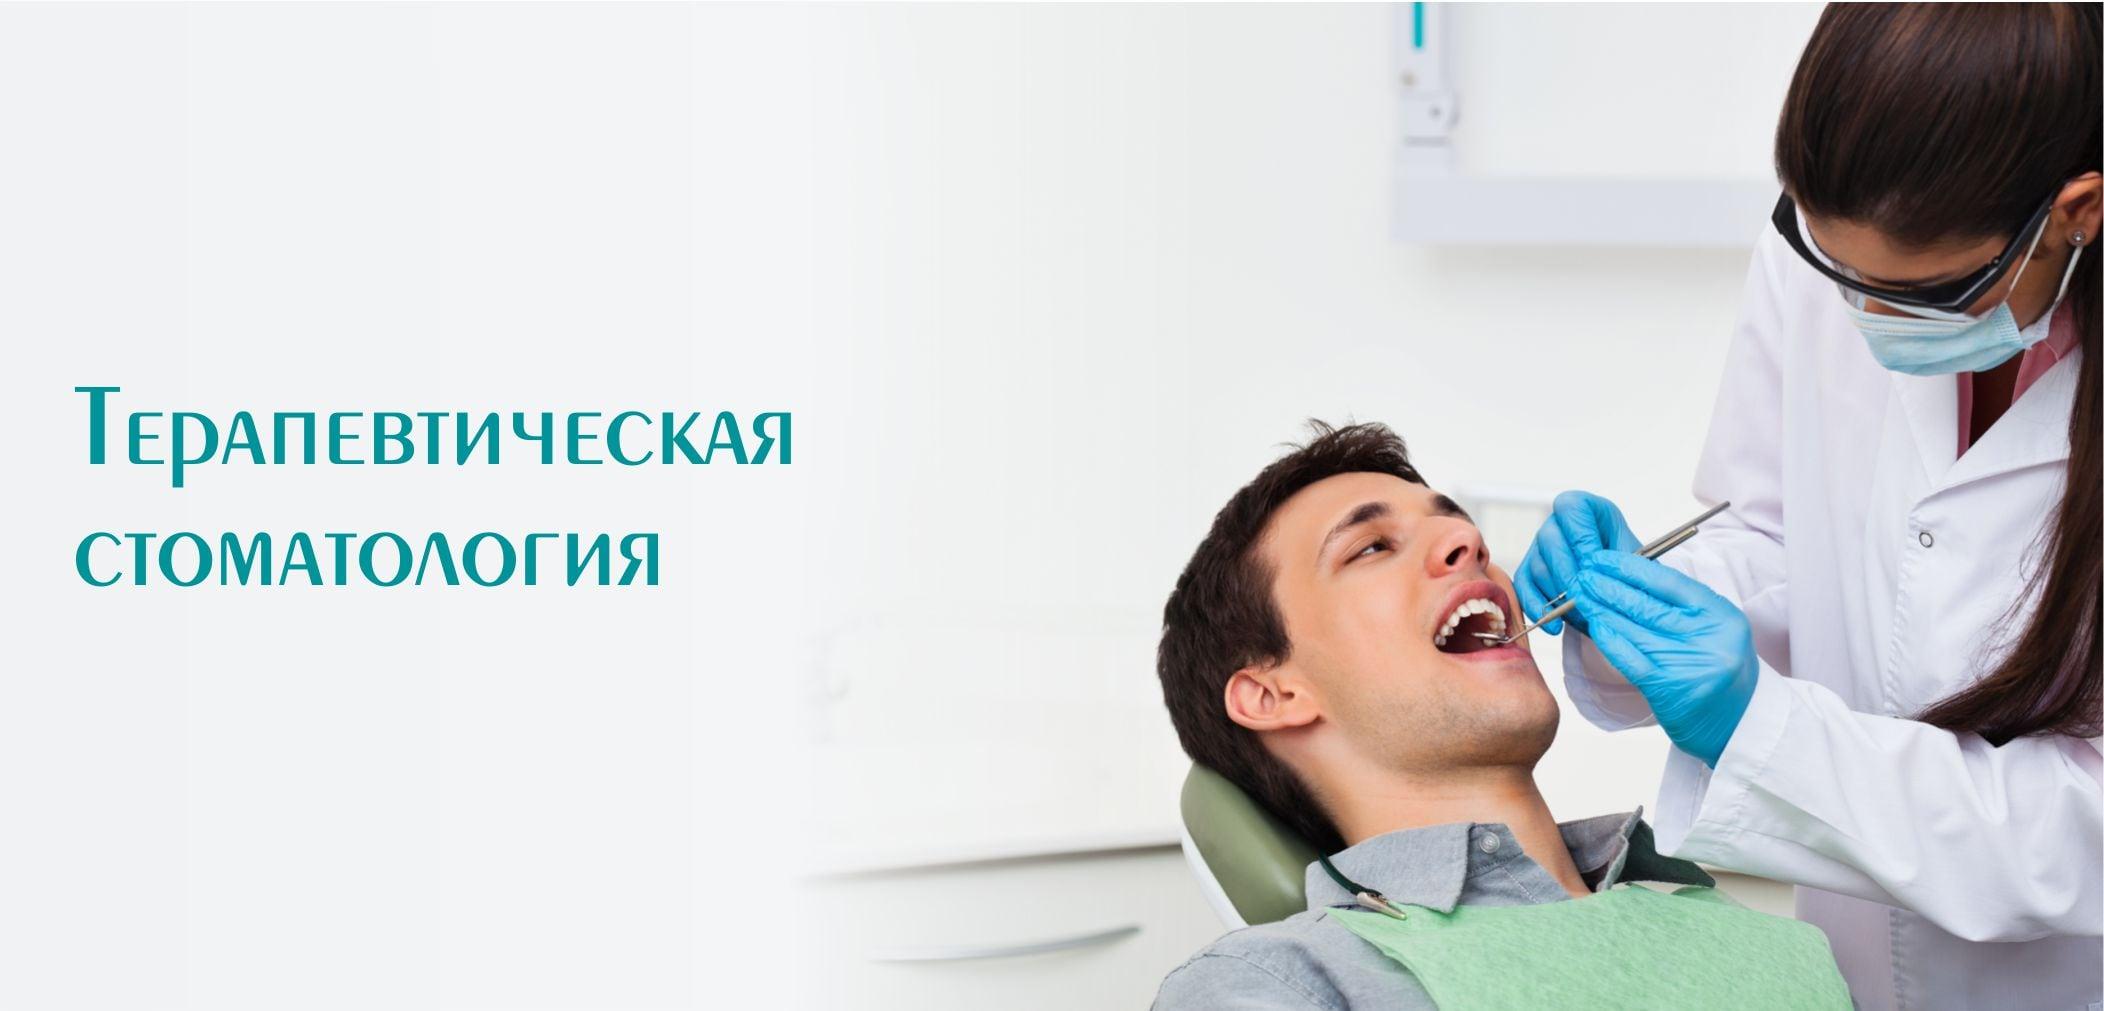 терапевт- стоматолог_01